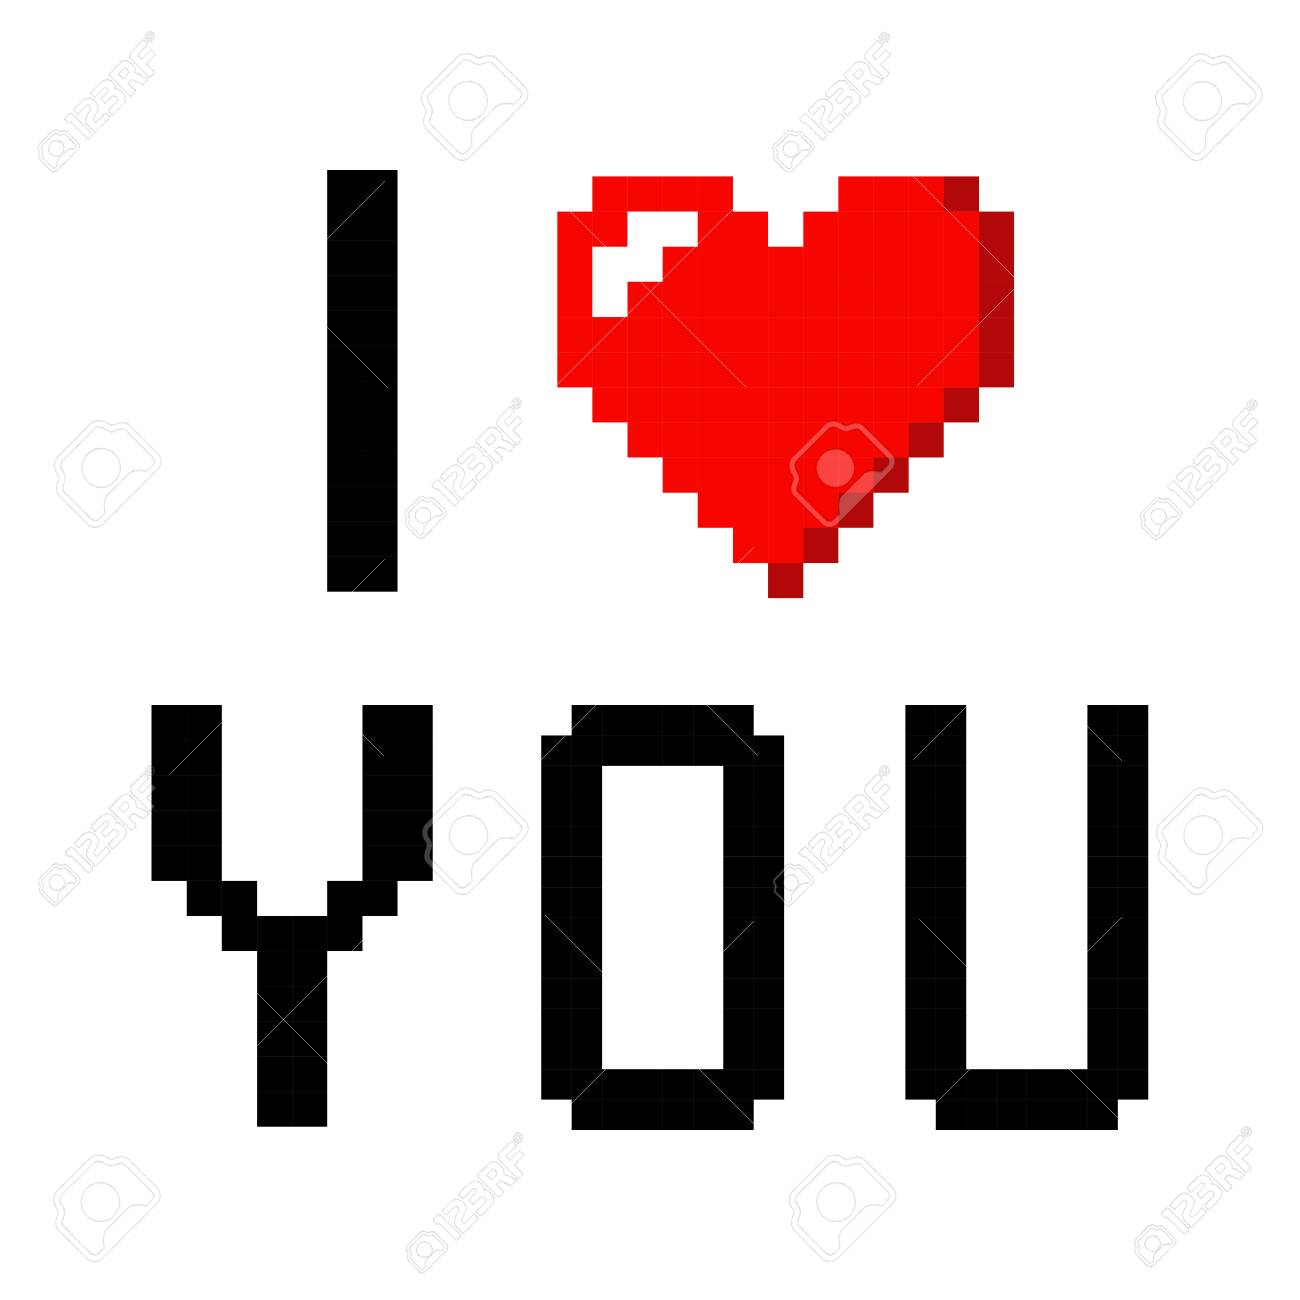 Pixel Art Heart I Love You Color Icon Valentine